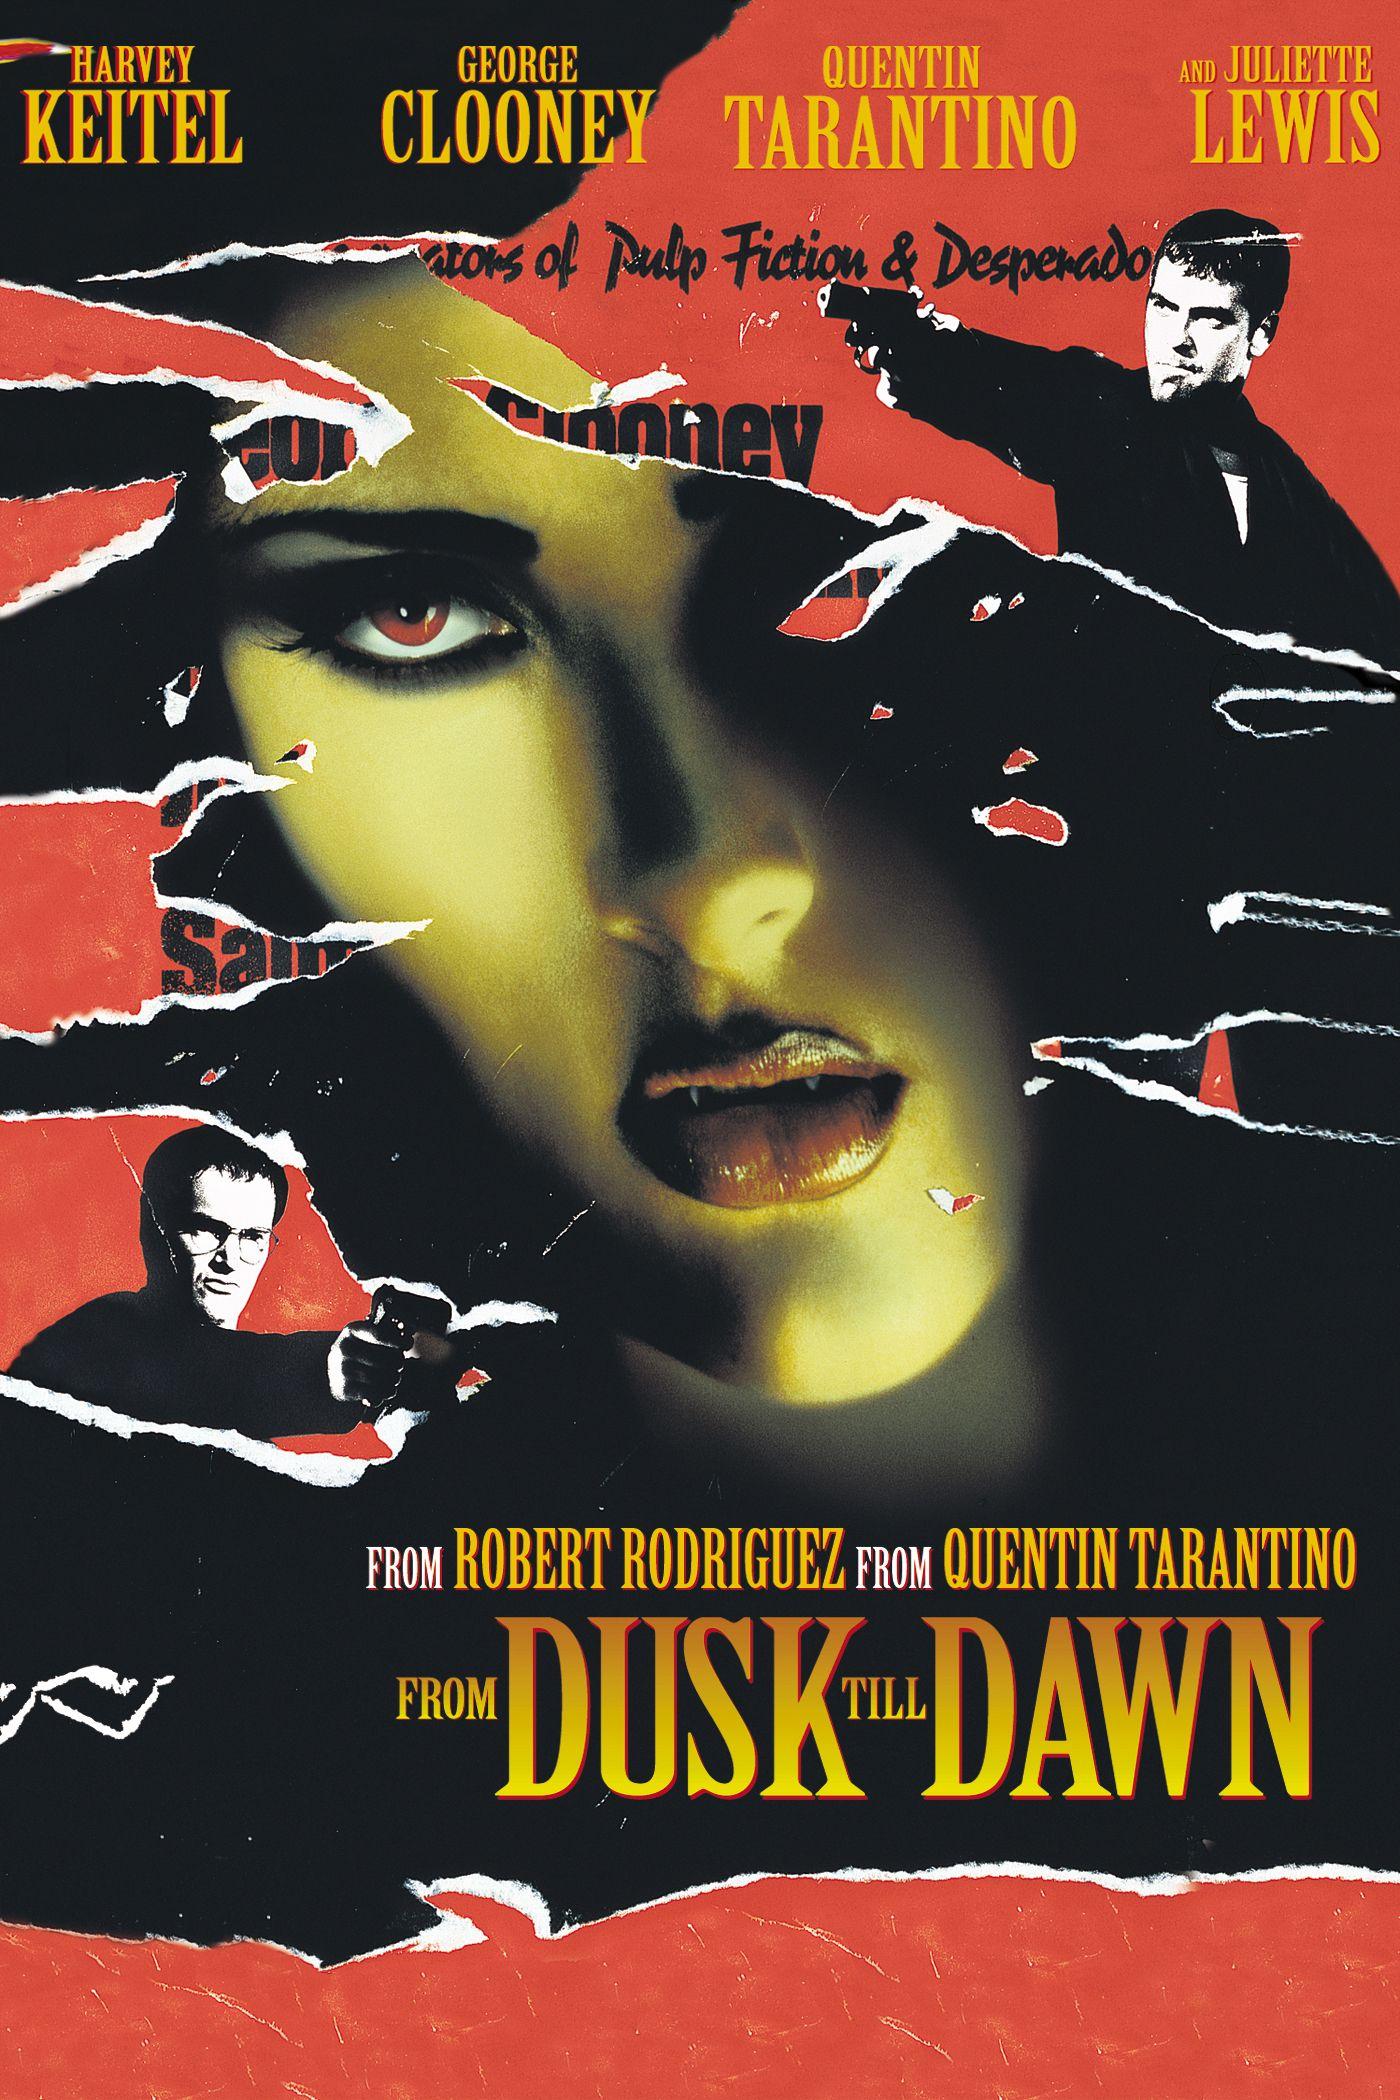 quentin tarantino movie posters poster artwork